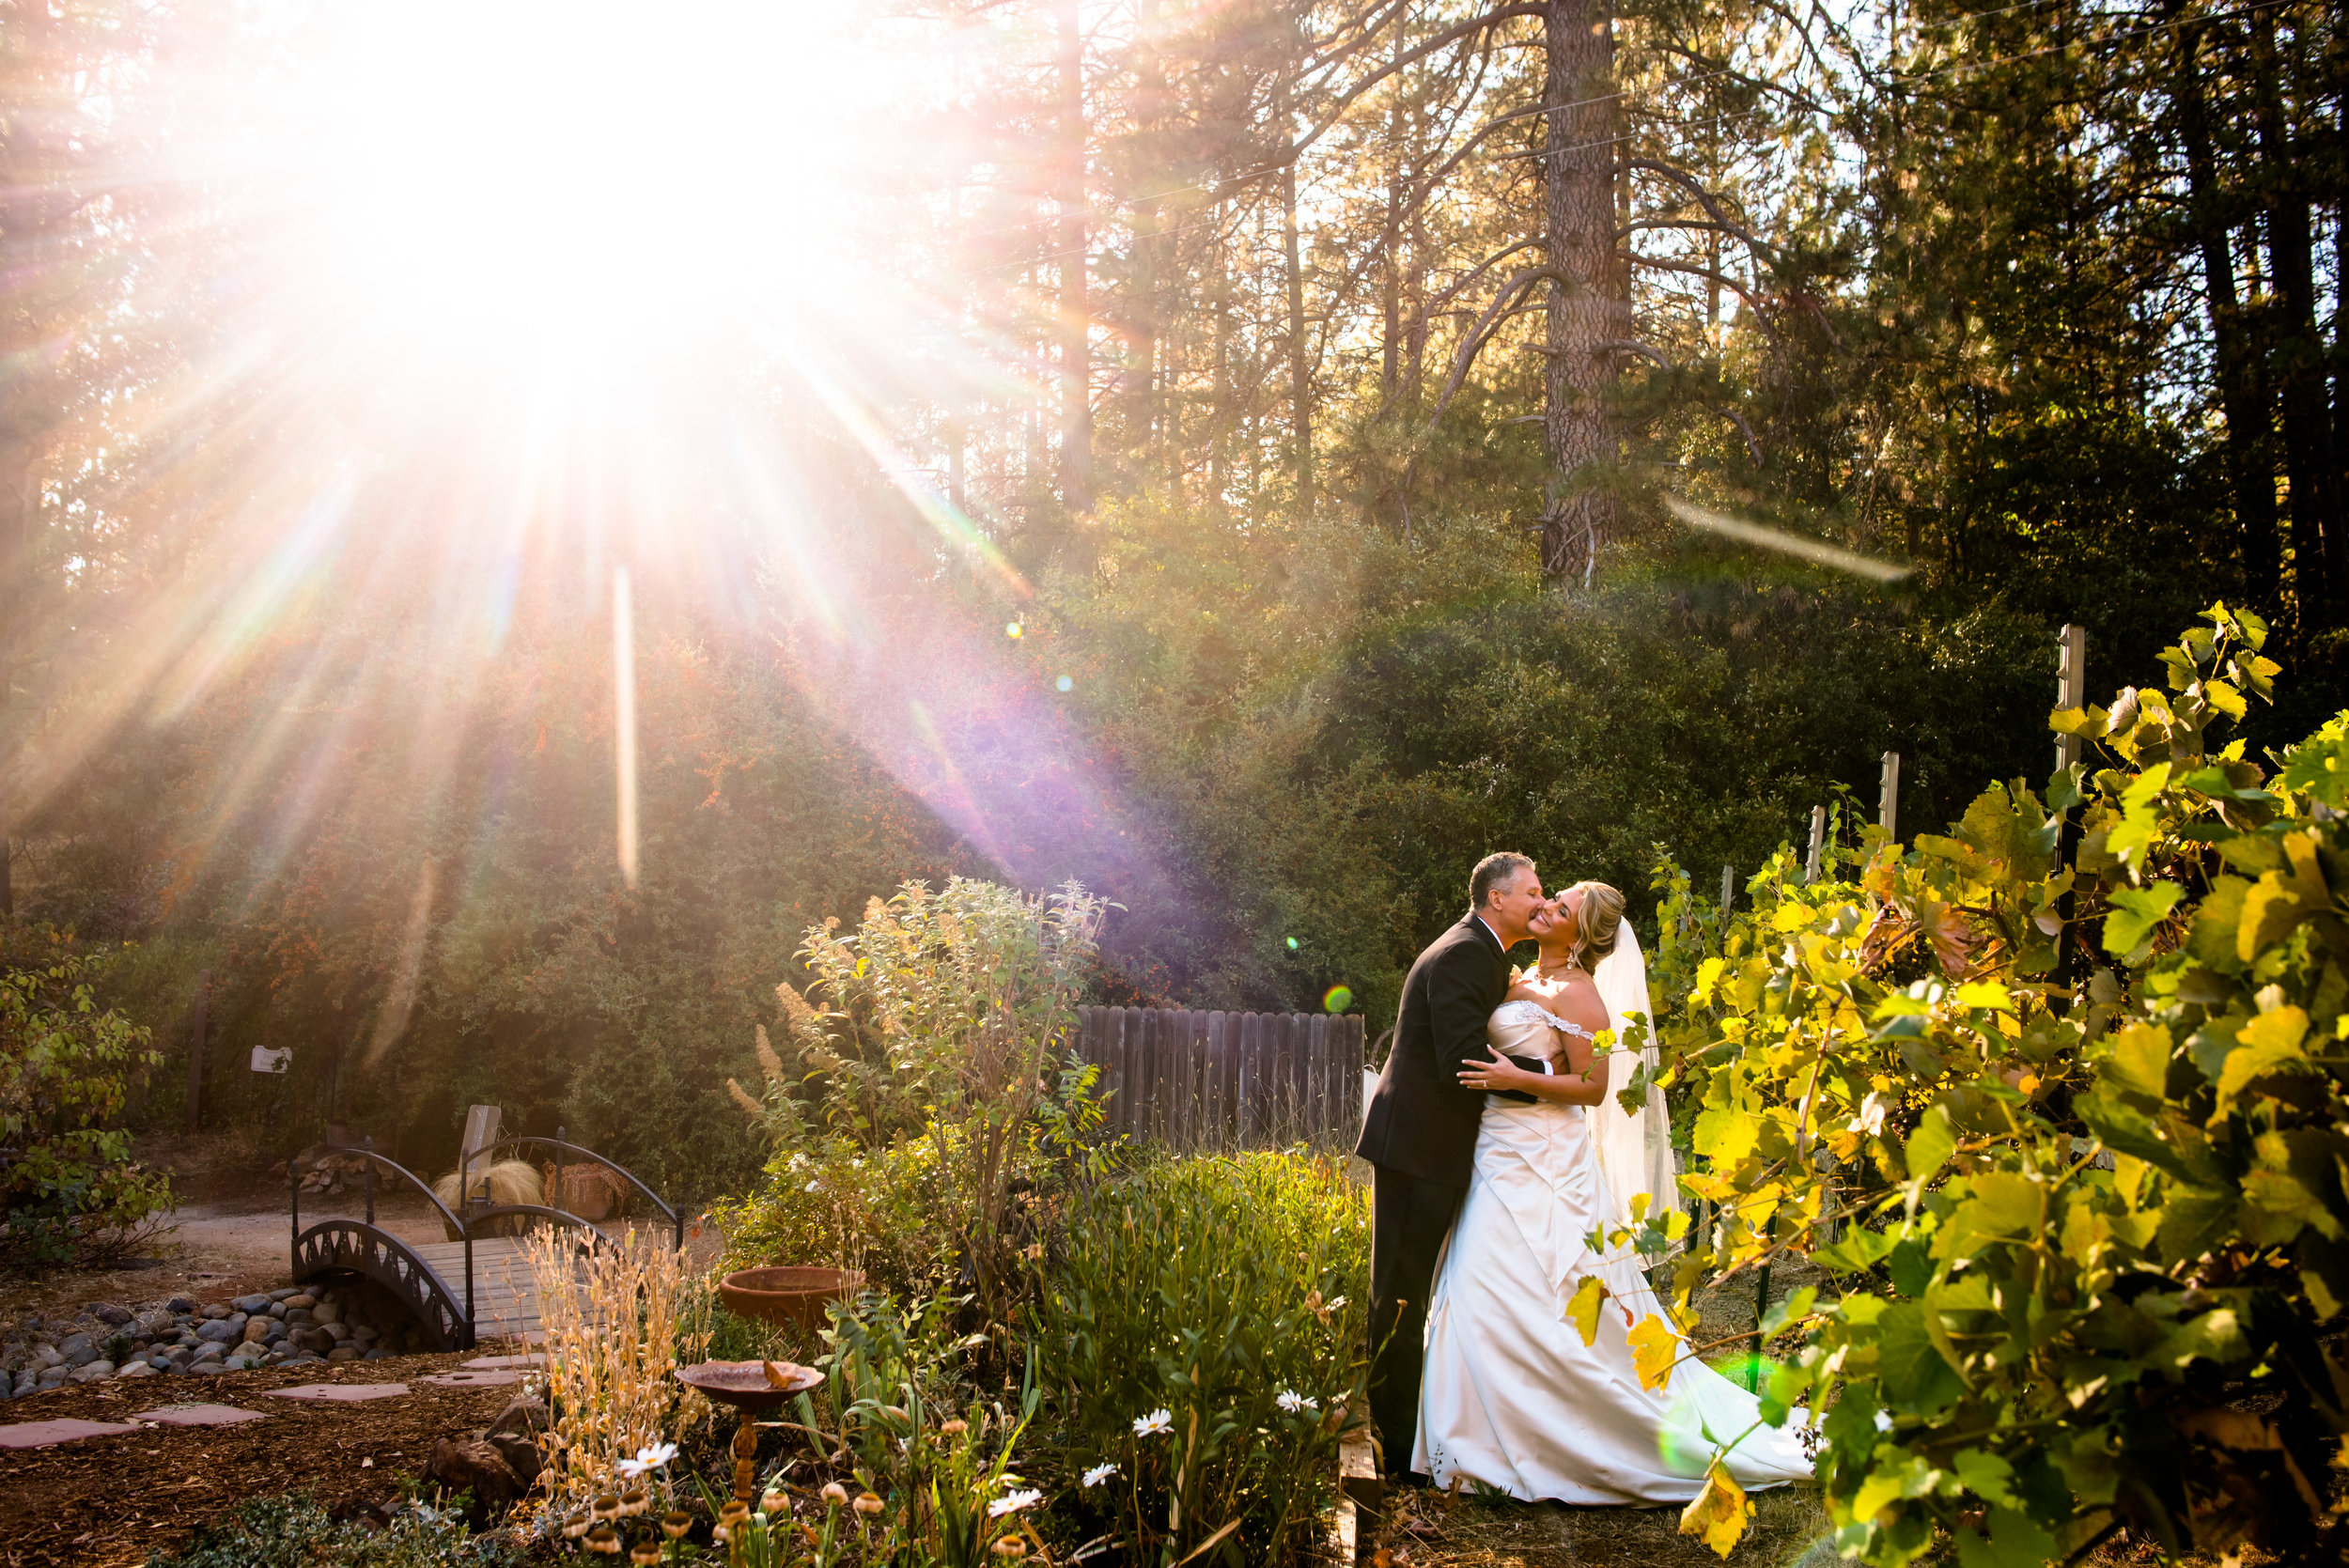 kara-craig-023-monte-verde-inn-sacramento-wedding-photographer-katherine-nicole-photography.JPG